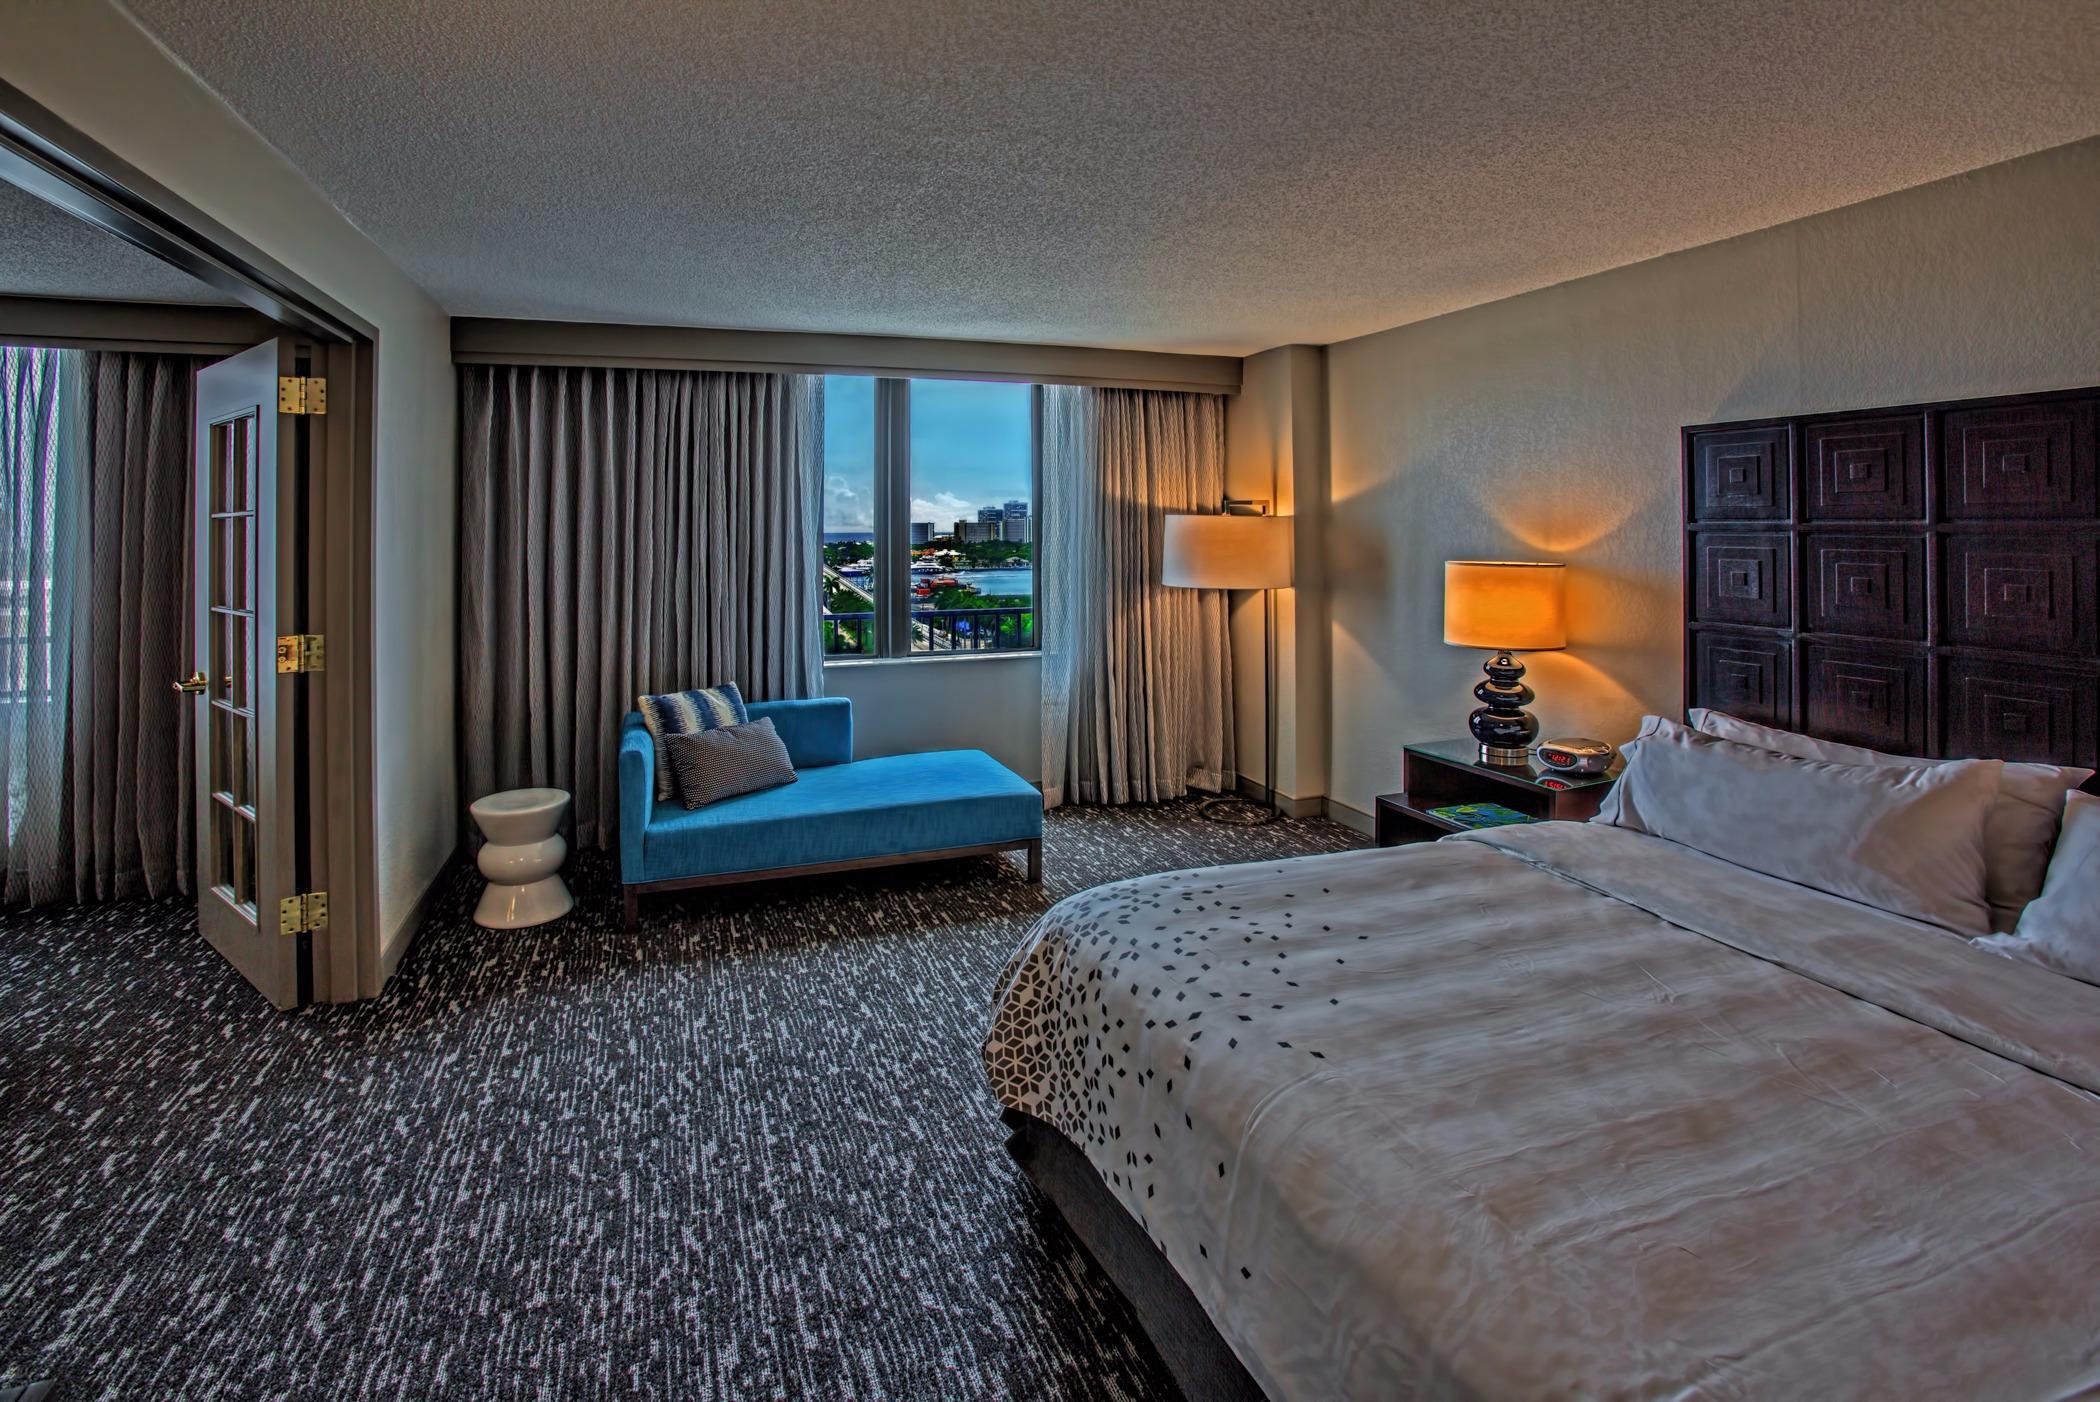 Renaissance Fort Lauderdale Cruise Port Hotel image 9